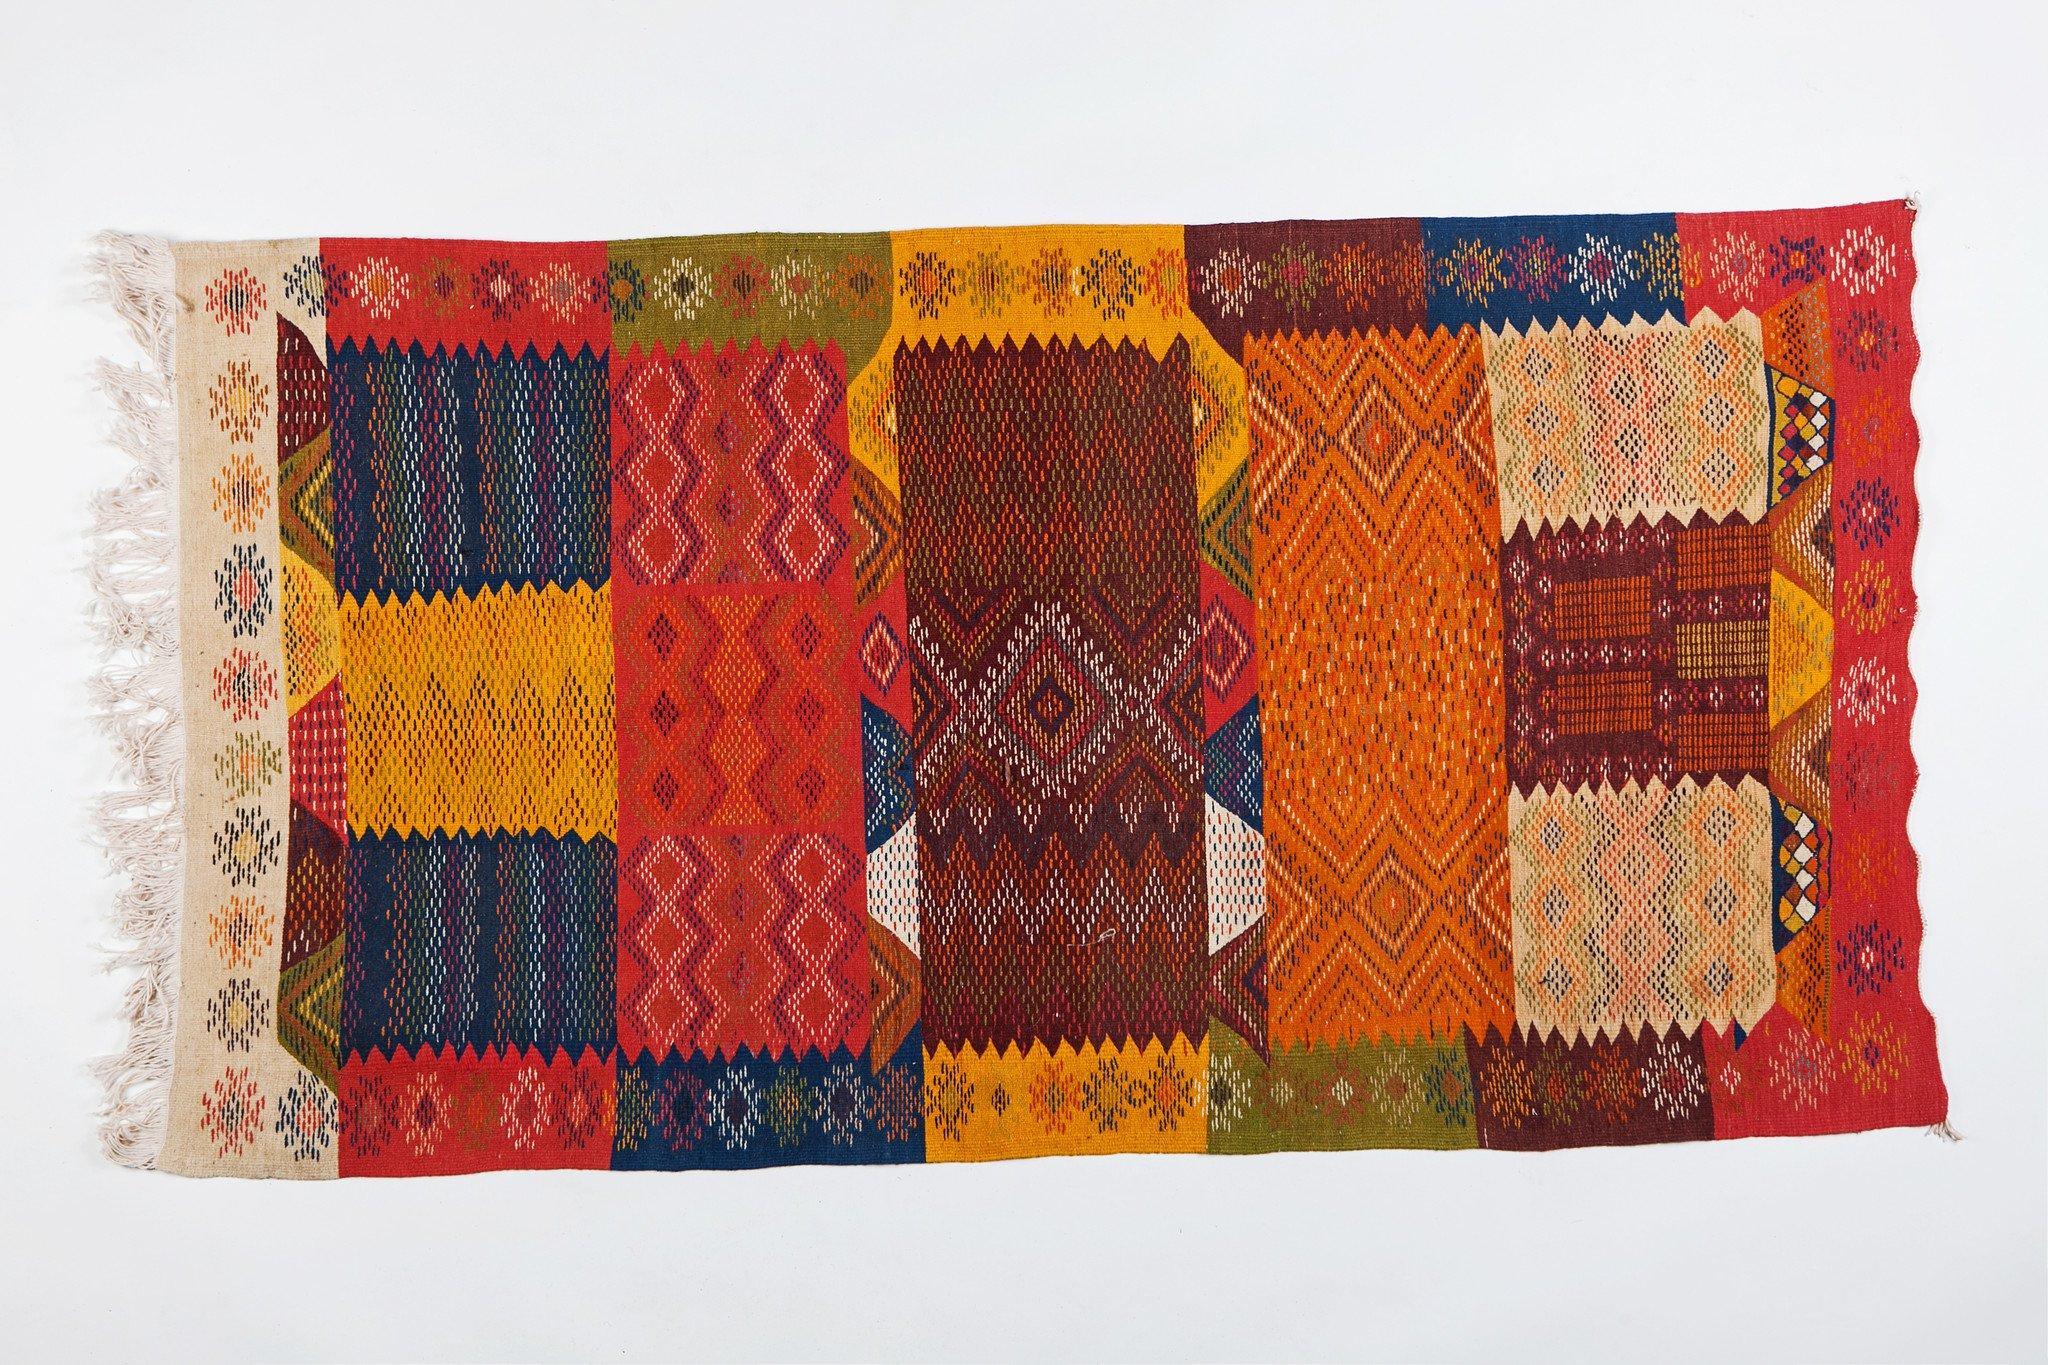 Berber Medium Rug - Handwoven Wool with Organic Multicolor Dye